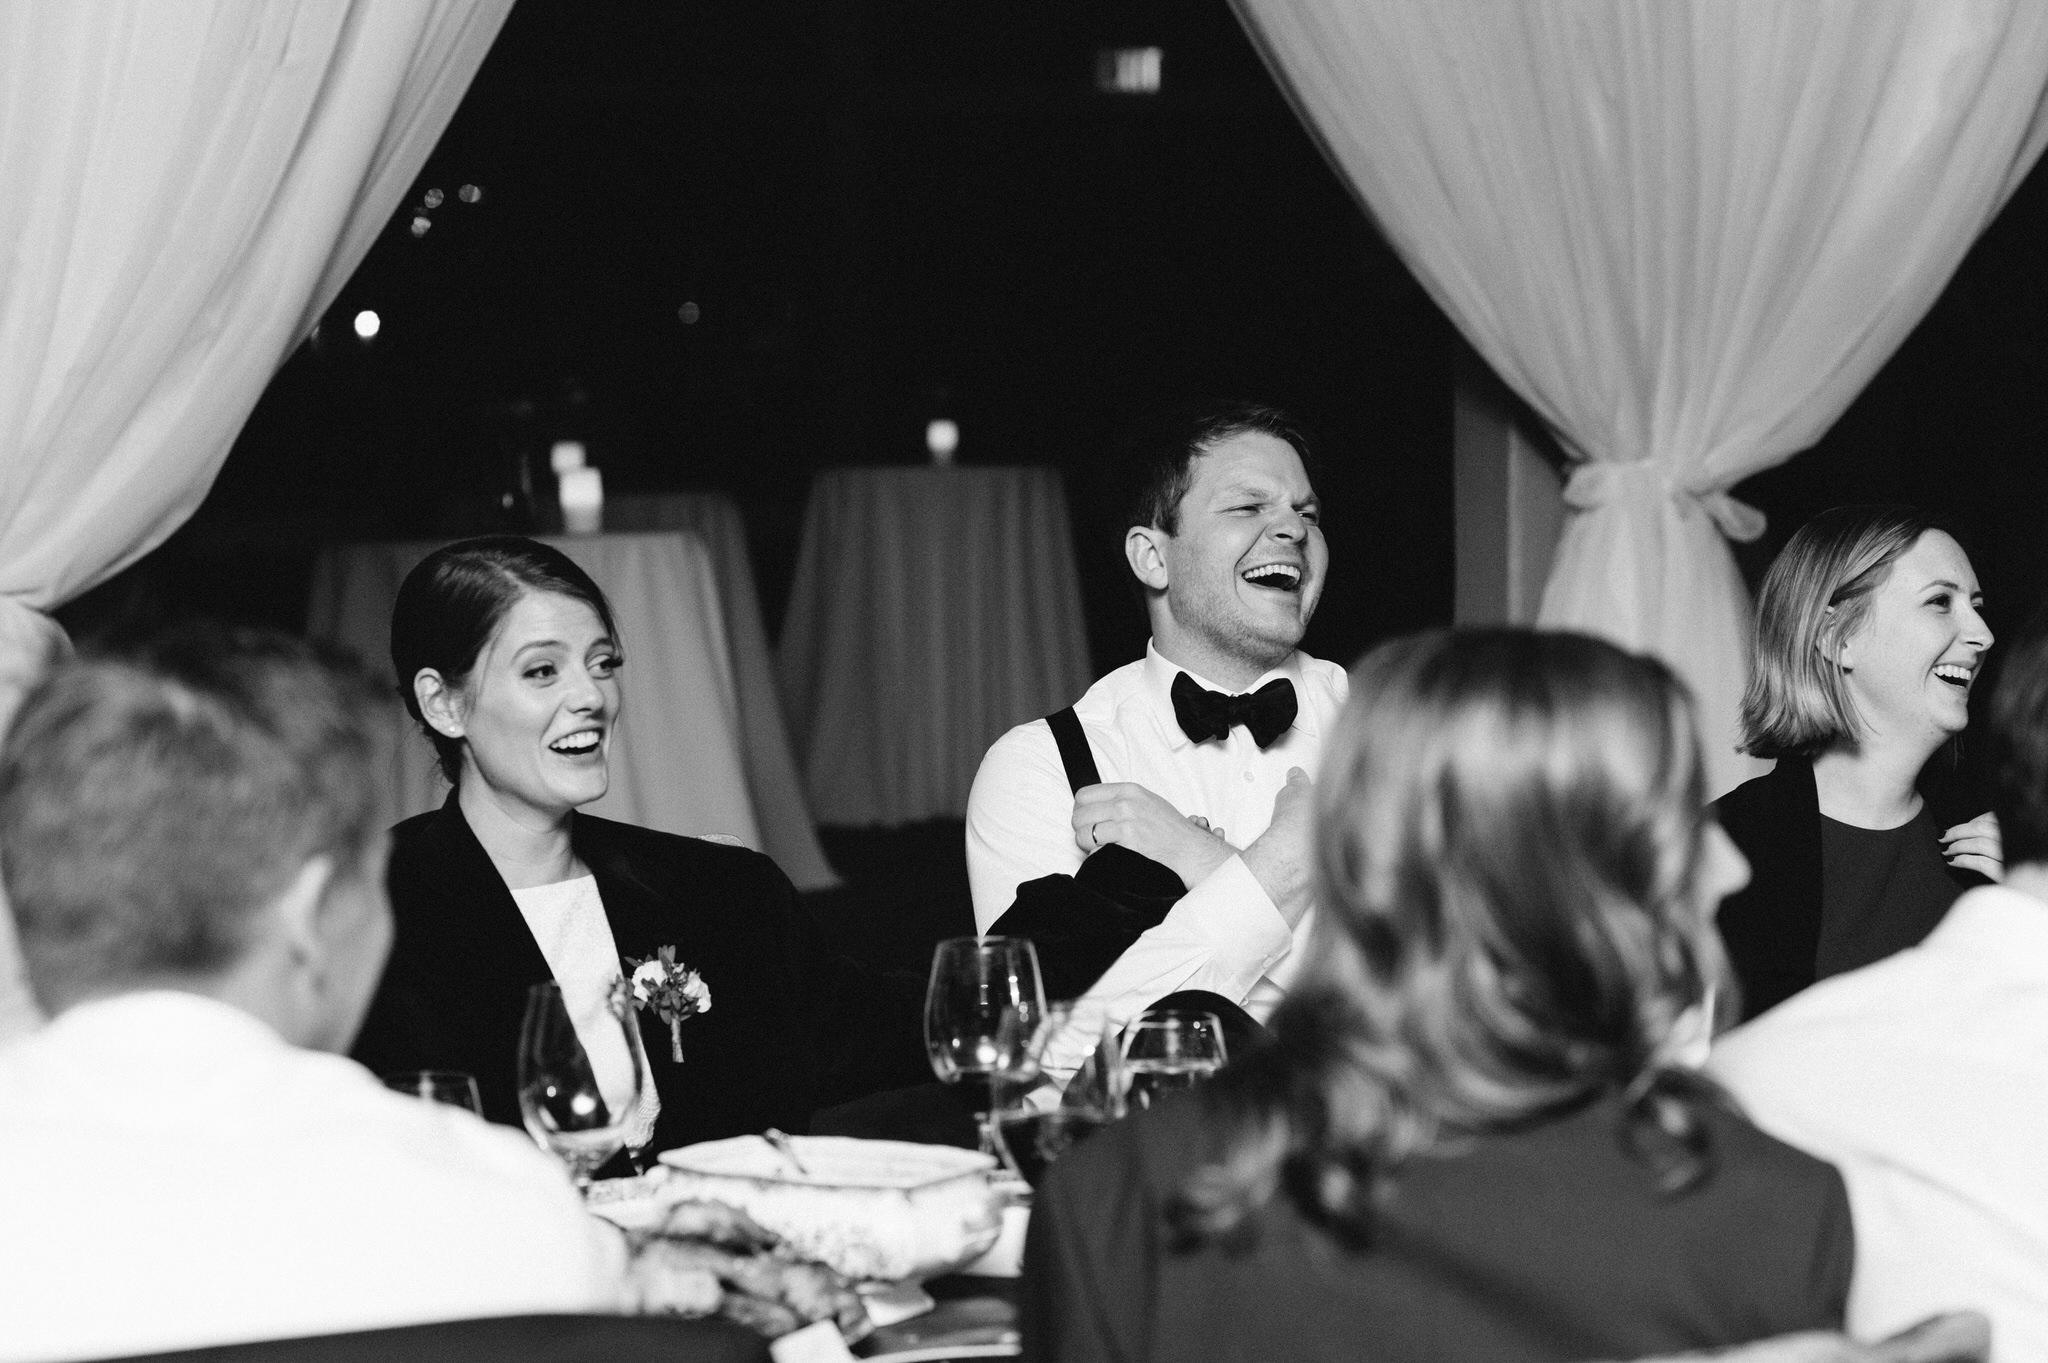 scarletoneillphotography_weddingphotography_prince edward county weddings156.JPG